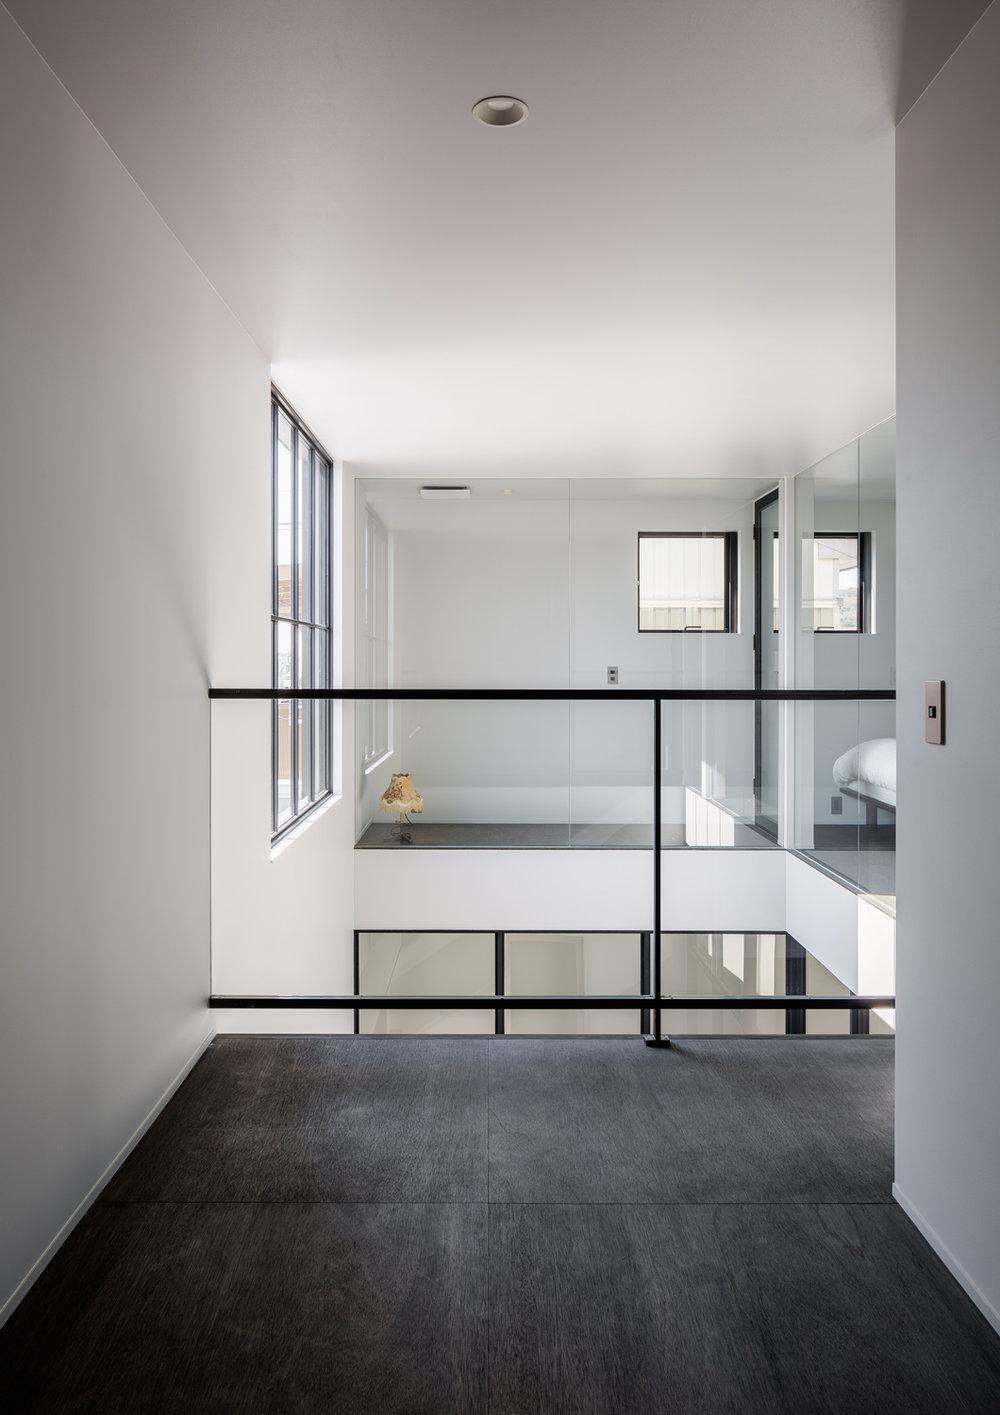 Residence in Takariya designed by Nakasai Architects